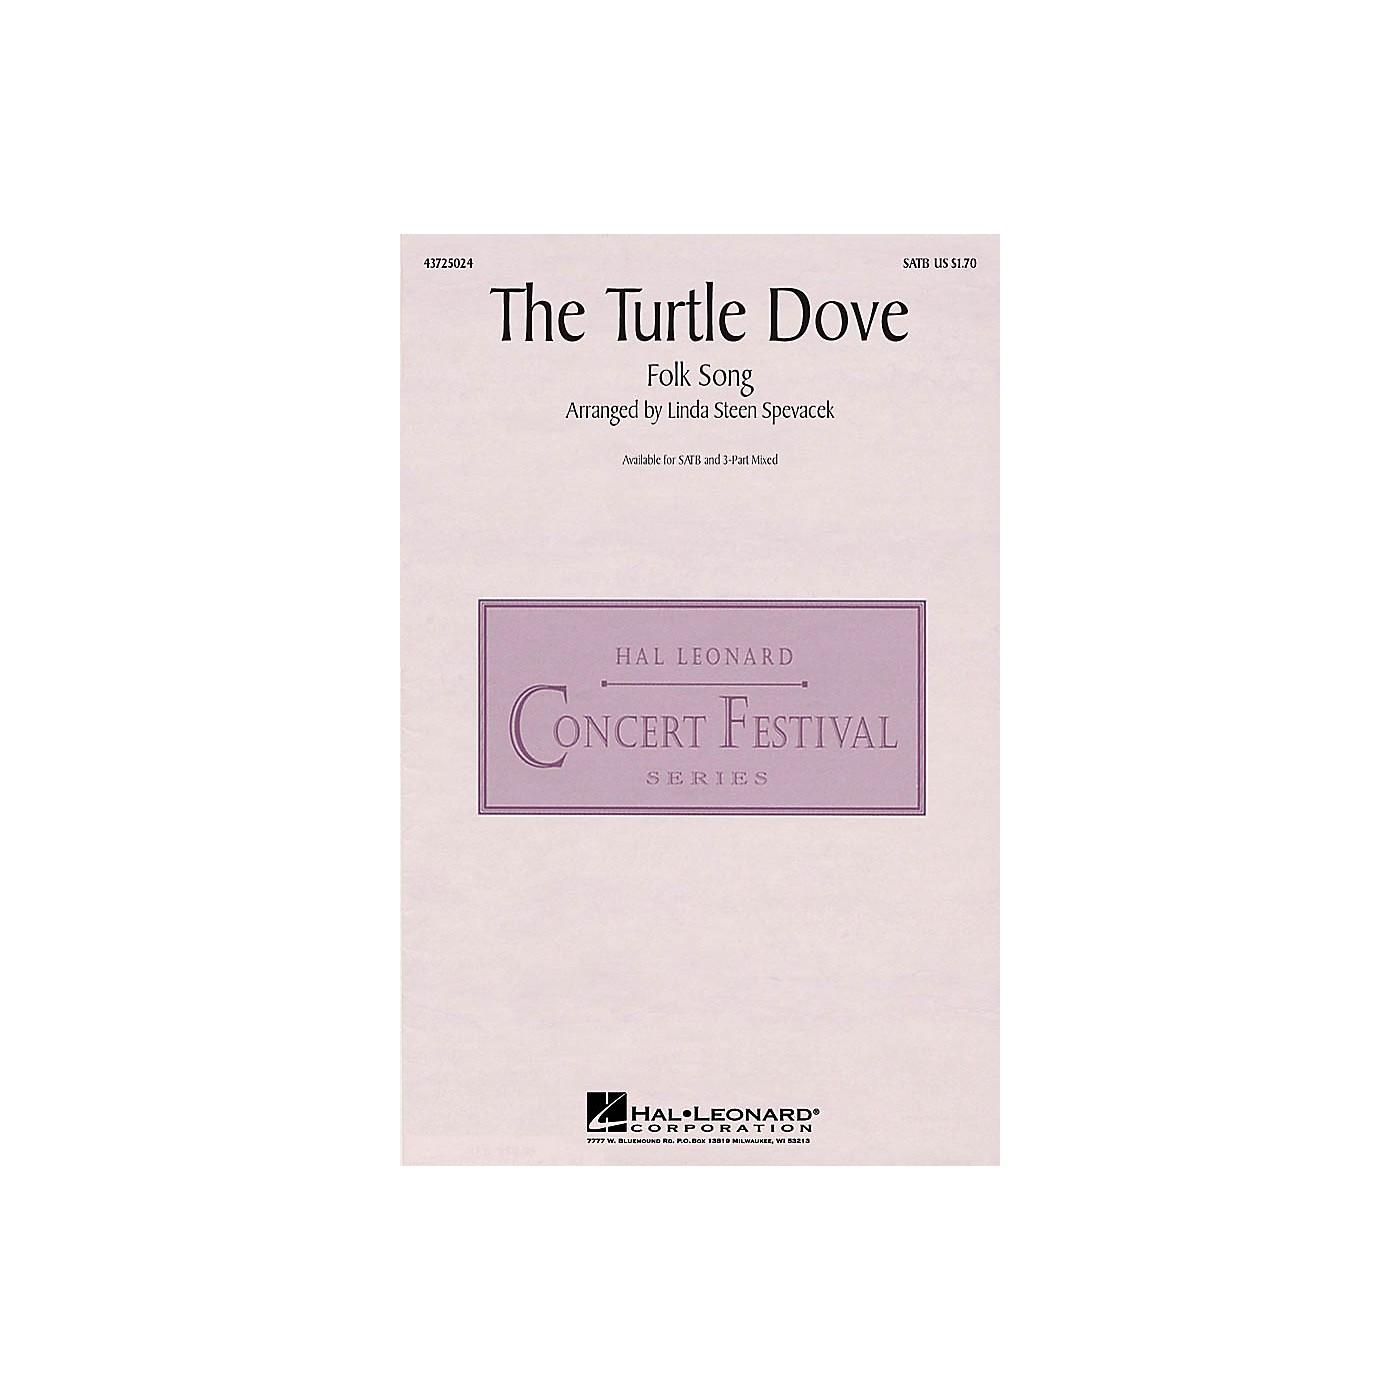 Hal Leonard The Turtle Dove SATB arranged by Linda Spevacek thumbnail